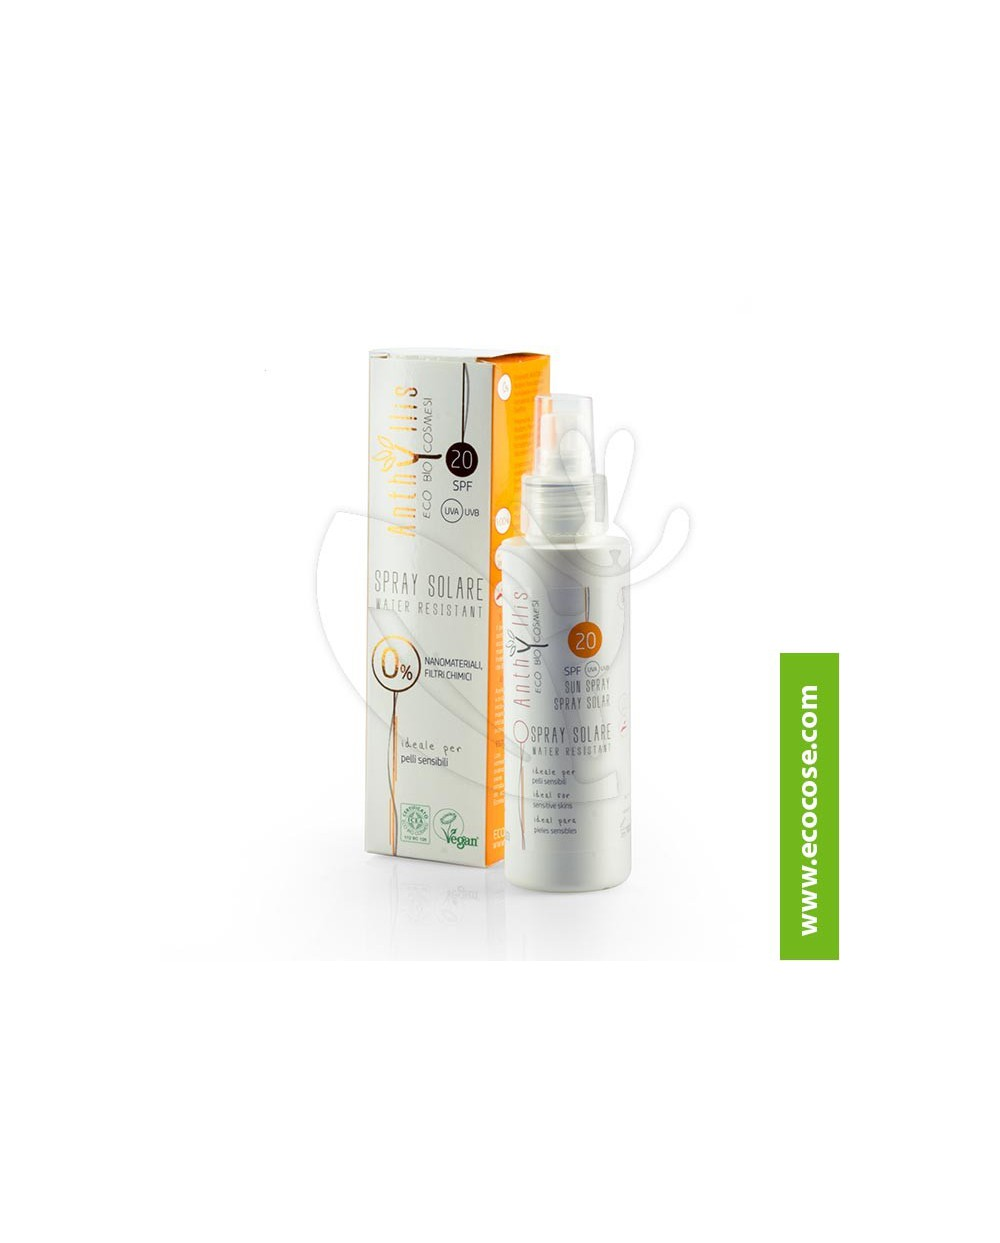 Anthyllis - Spray solare protezione media spf20